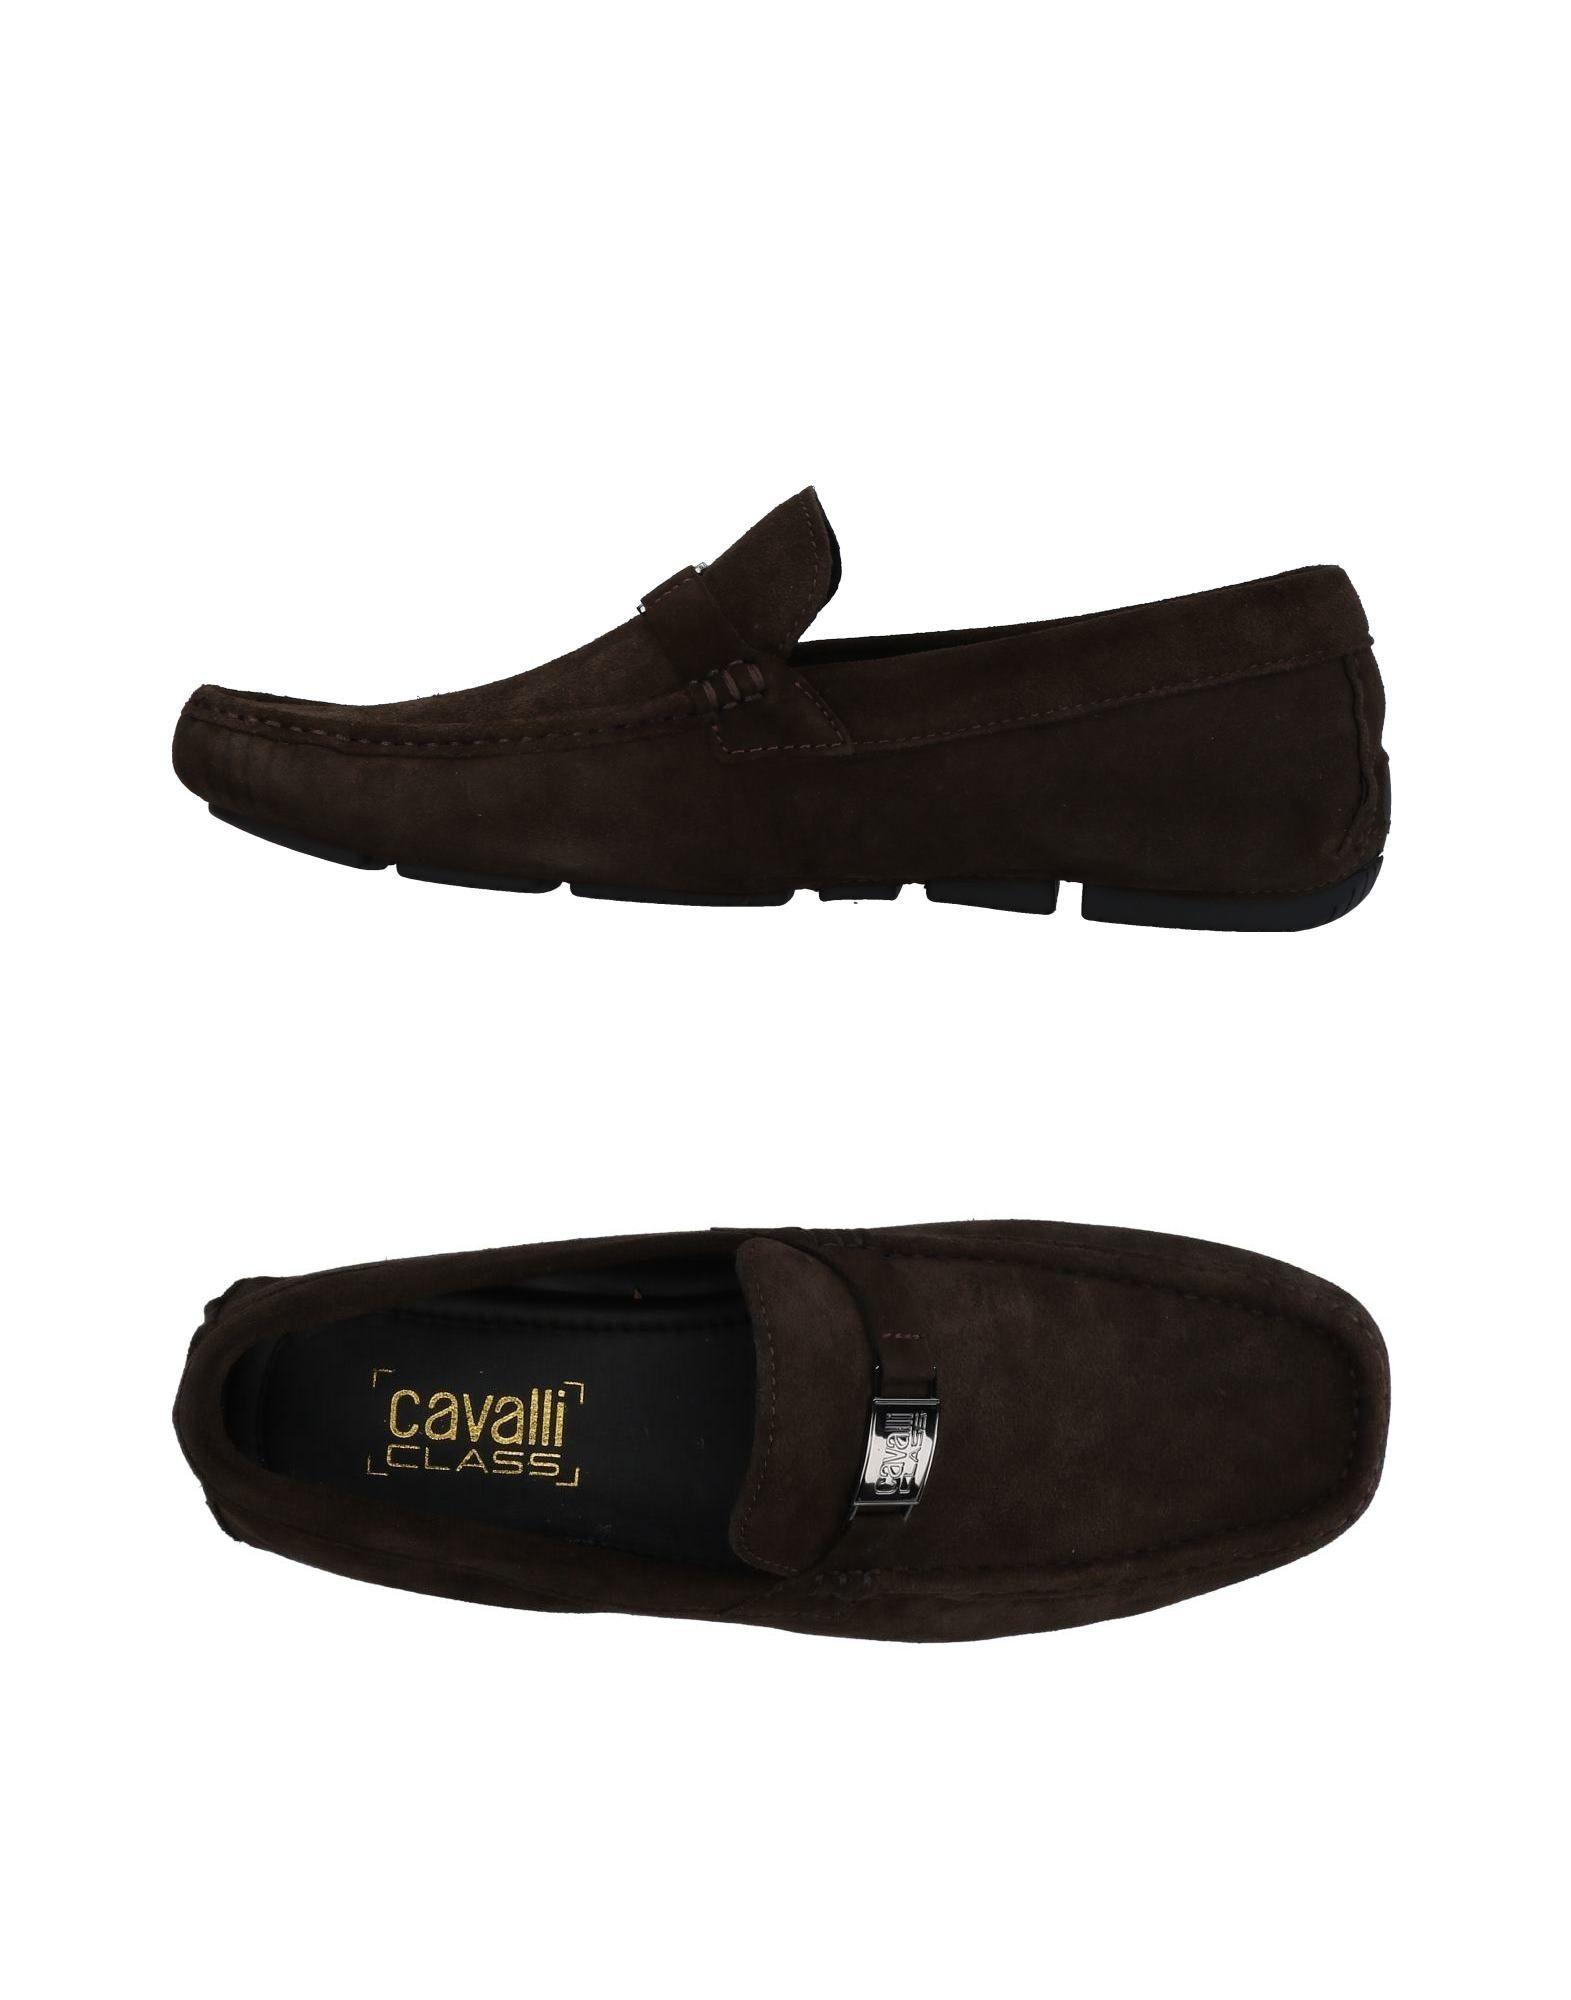 Class Roberto Cavalli Loafers - Men Class Roberto Cavalli Loafers - online on  Australia - Loafers 11451950RF 463b6b